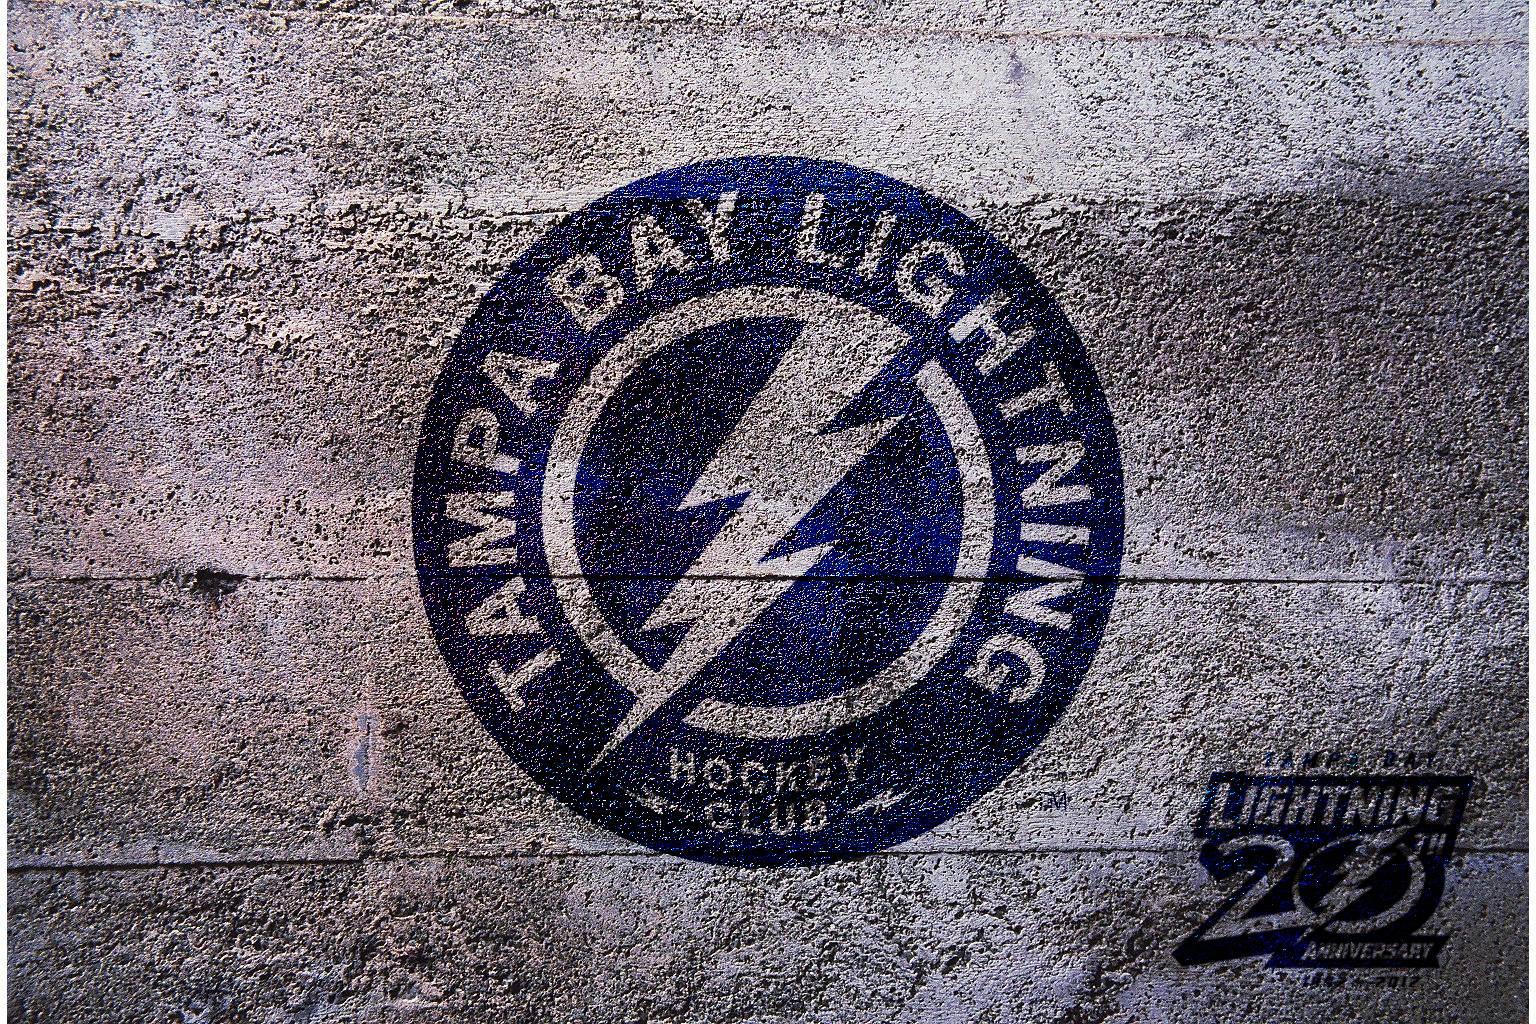 Tampa Bay Lightning Wallpapers 1536x1024